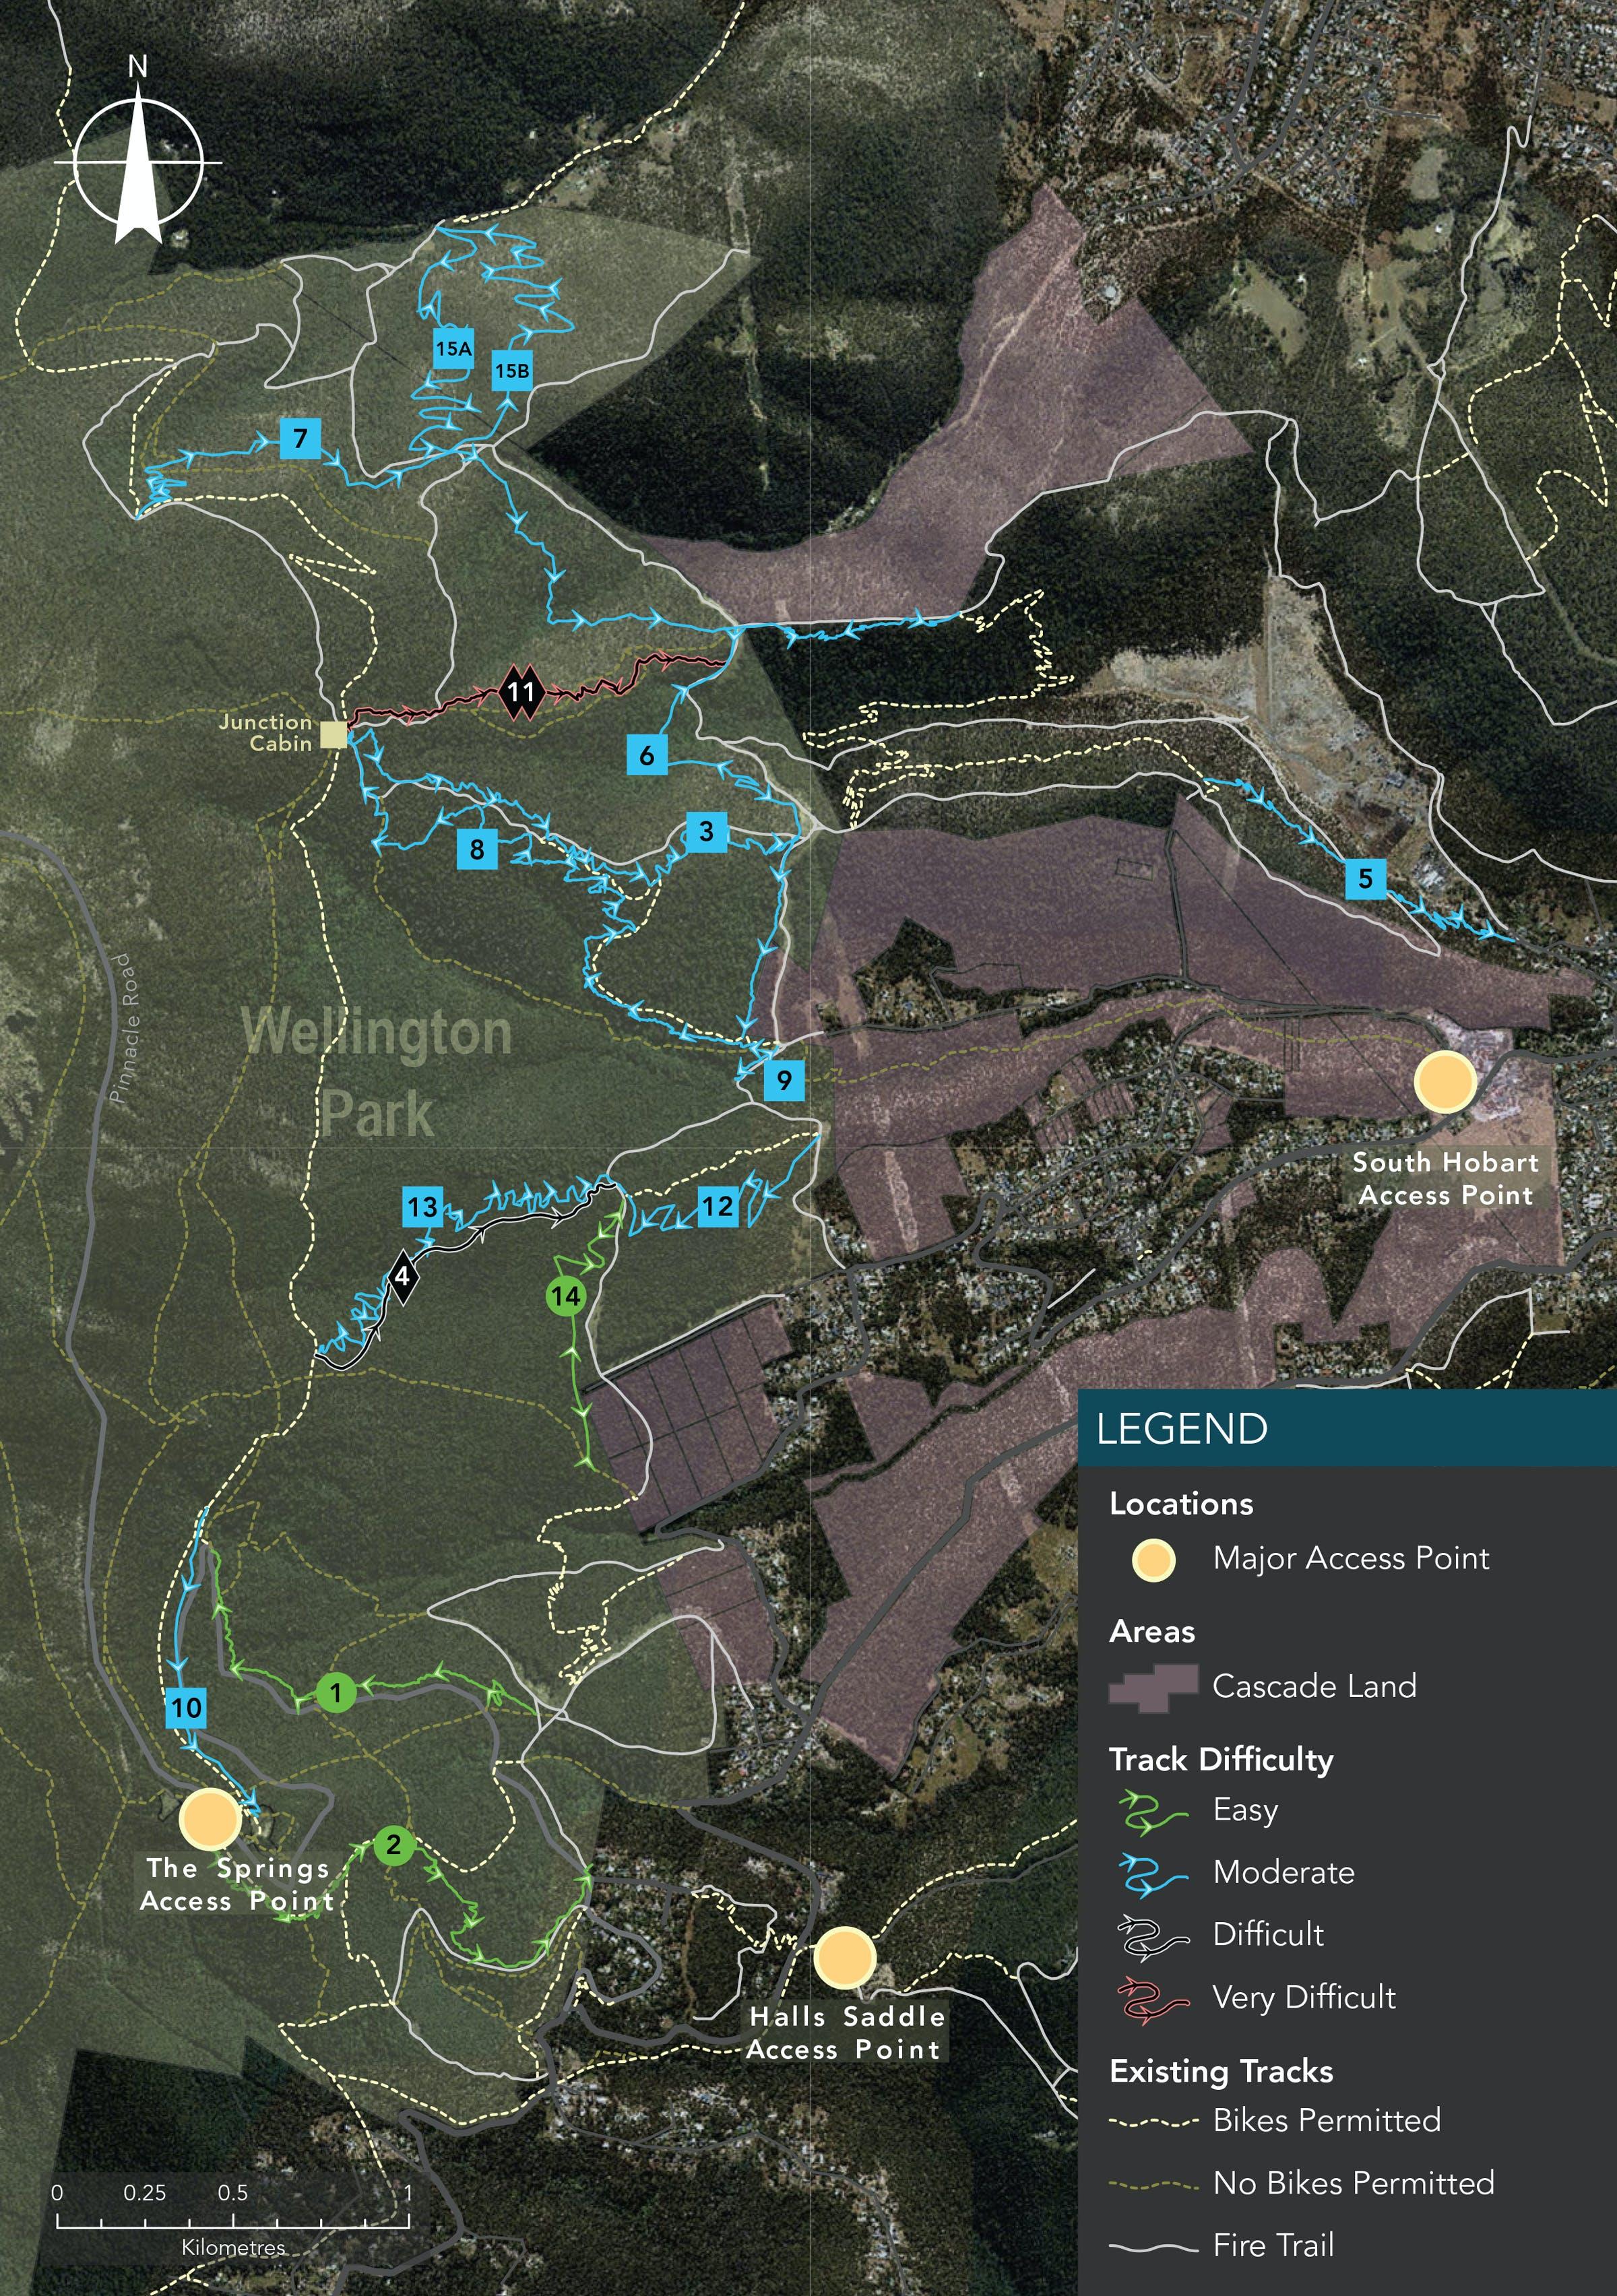 Map-Track-styles.jpg